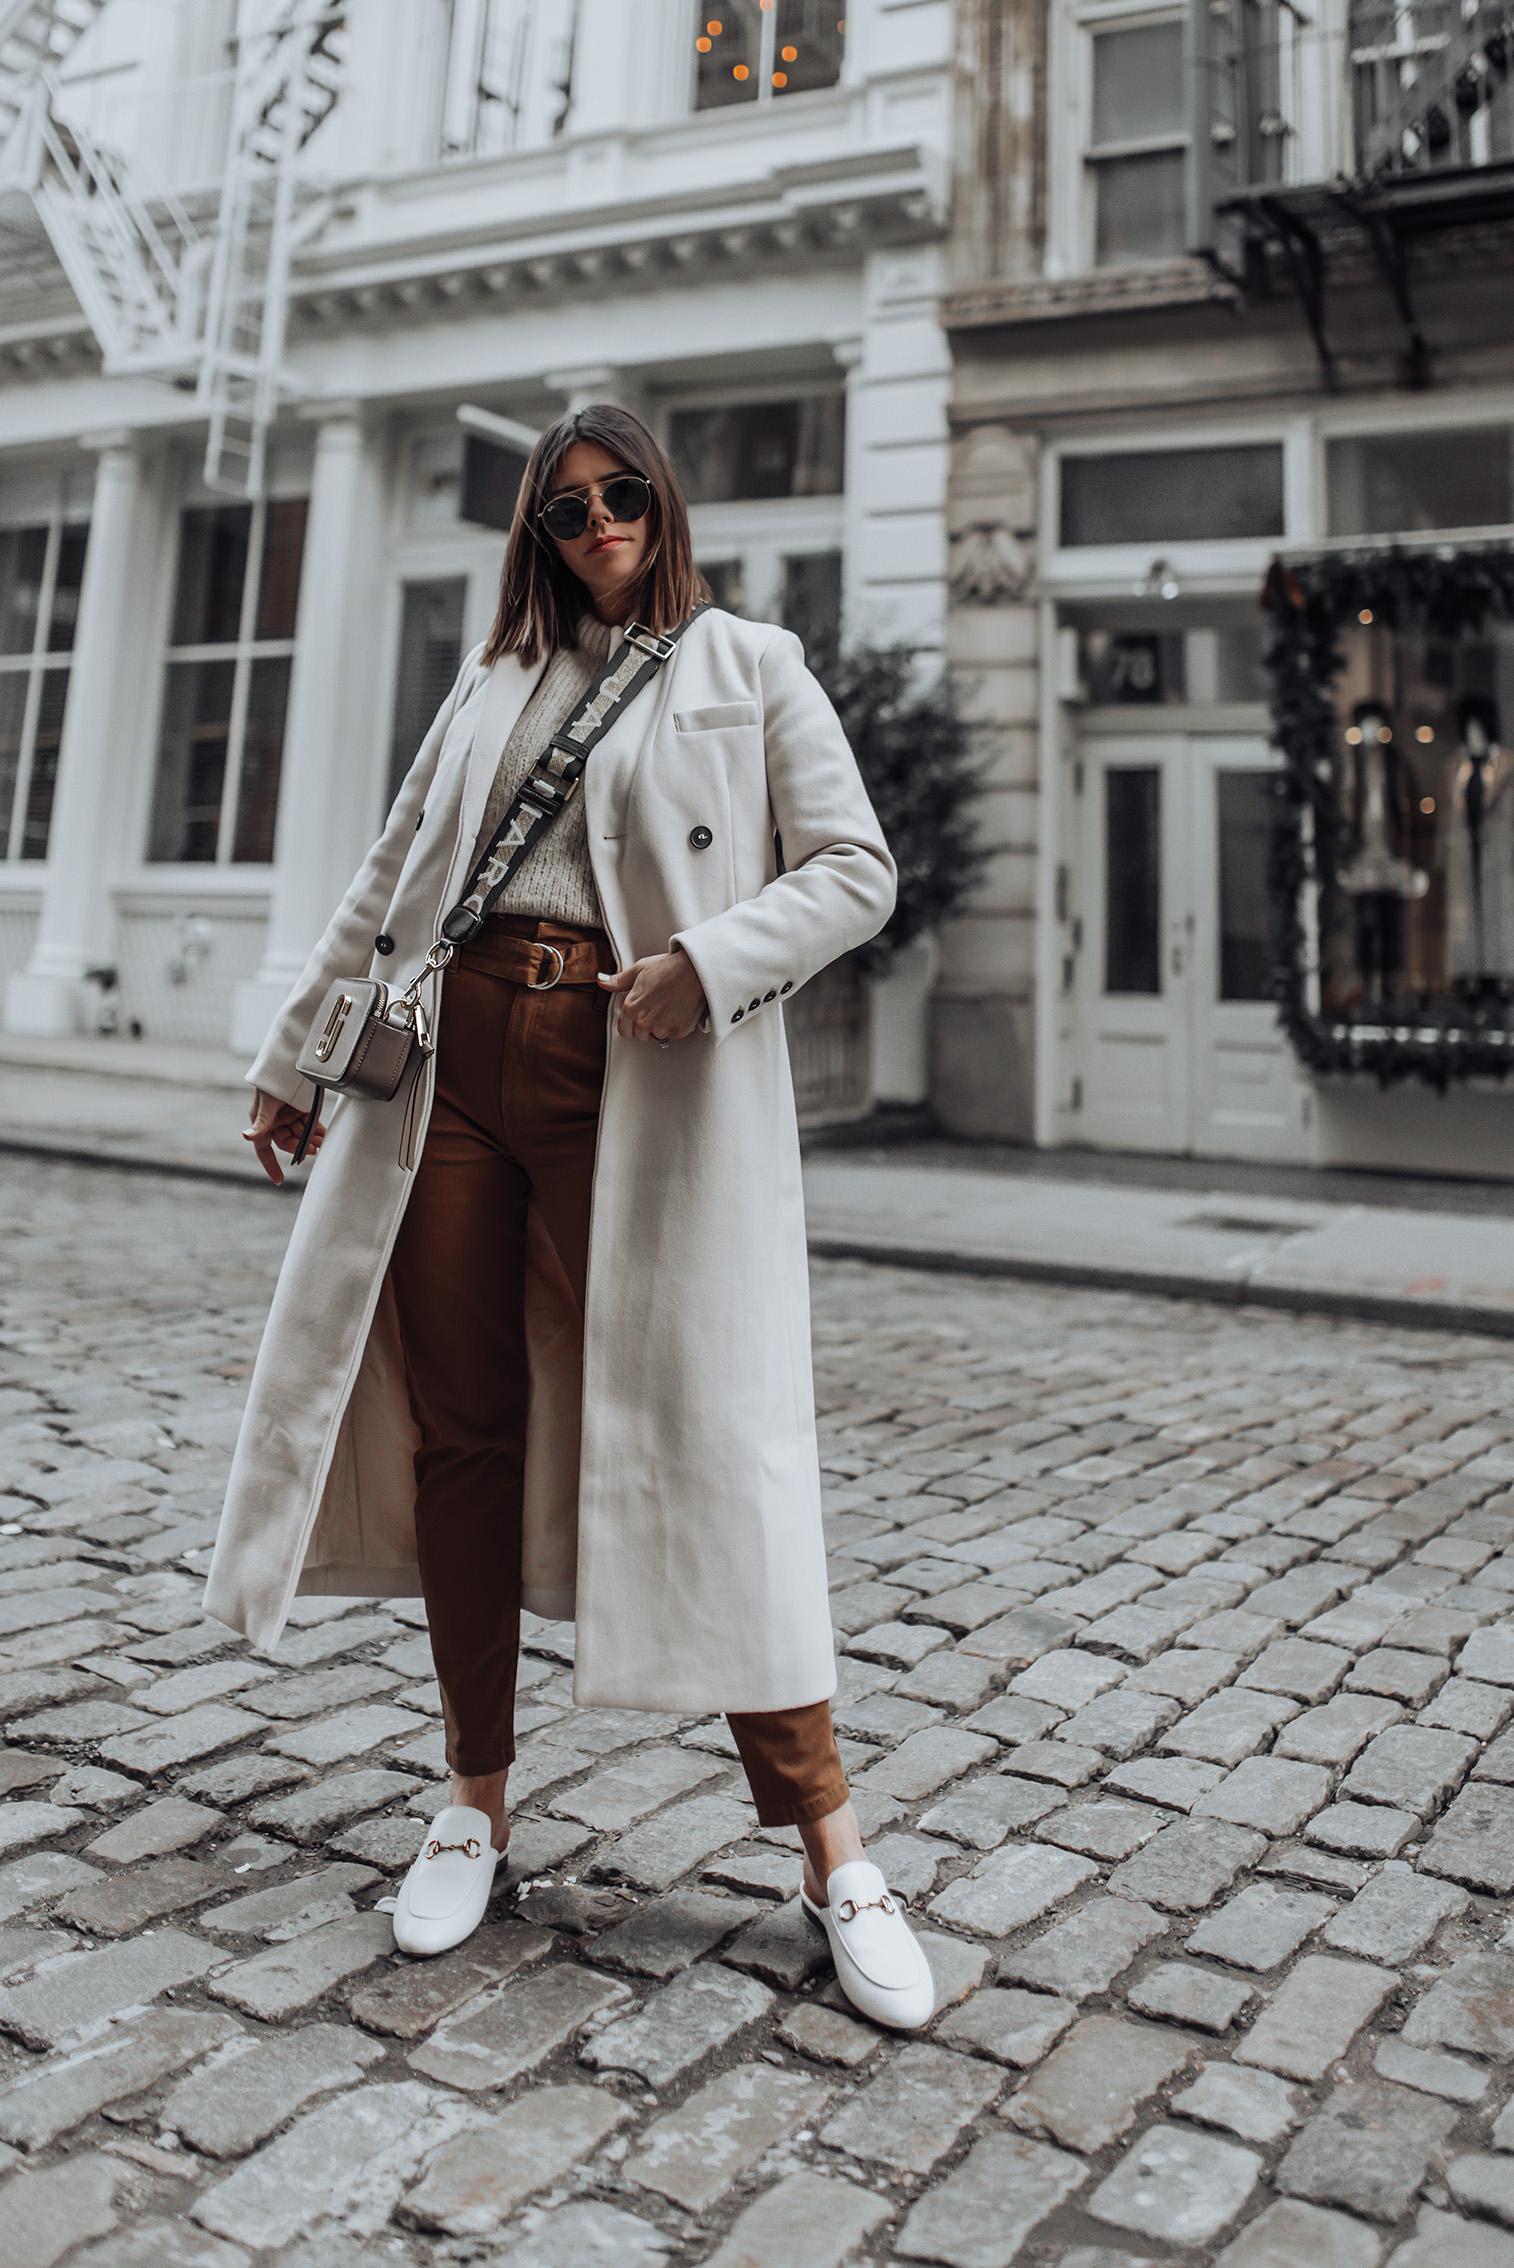 Pants (Berska, similar here and also love thispair) | Marc Jacobs Snapshot Camera Bag | Wool Coat (similar here) | Sweater| #streetstyle #marcjacobs #ootd